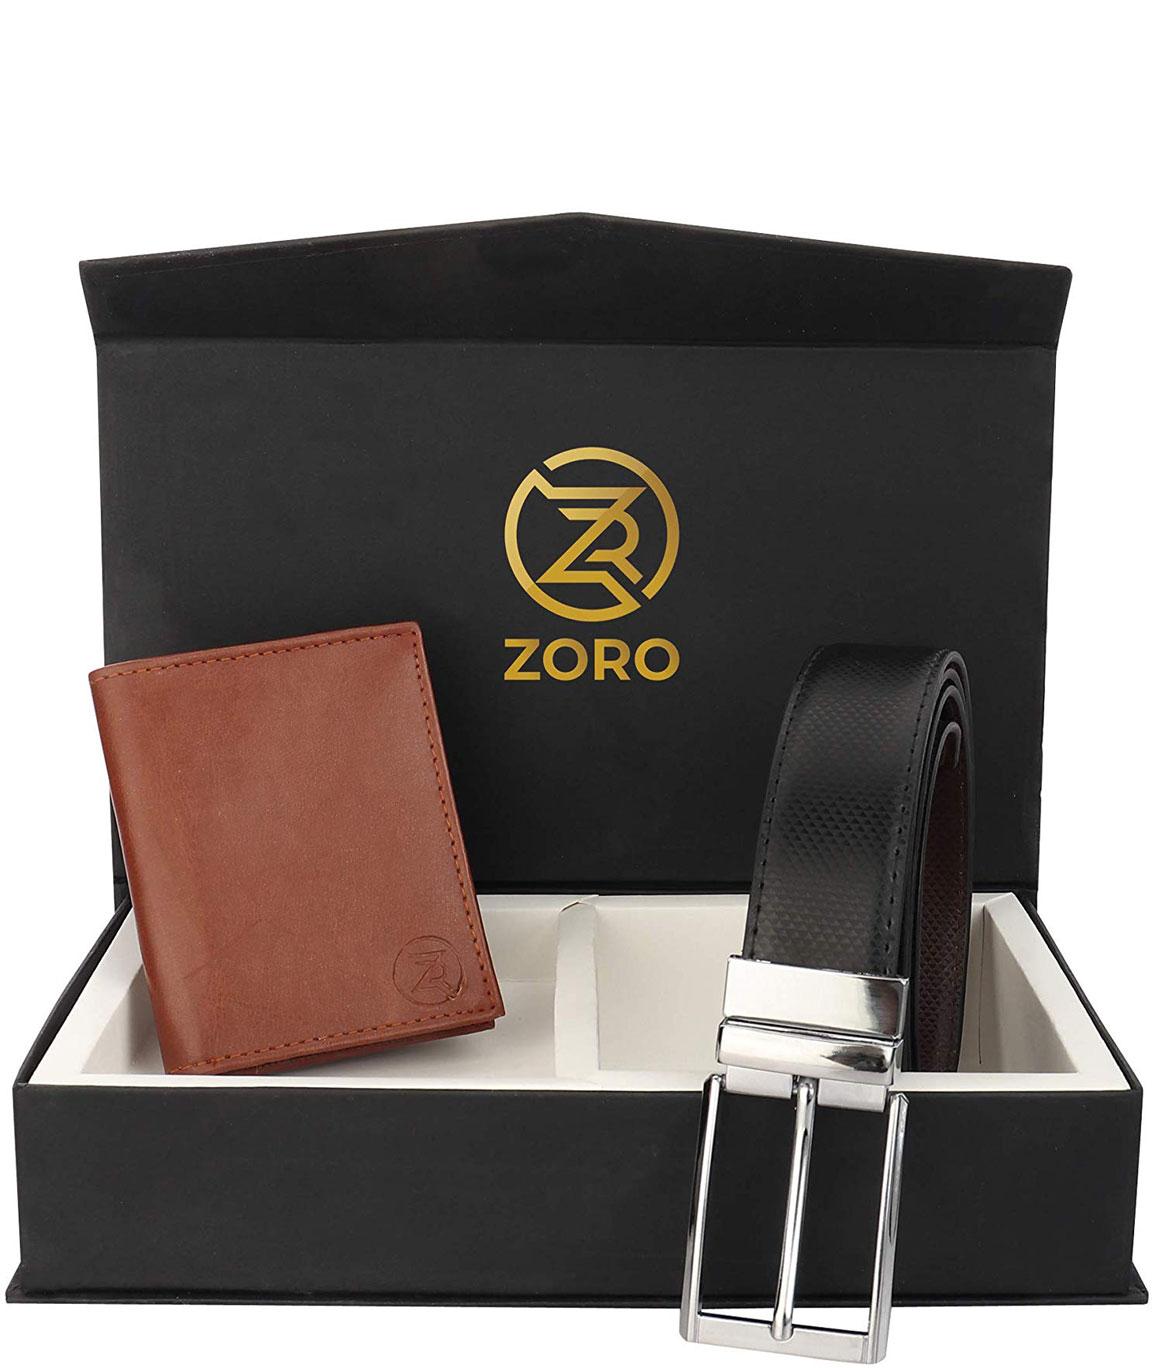 ZORO Reversible PU belt and wallet combo, formal black and brown reversible belt, gift for mens, gents belt, mens wallet ZR-CR04T-39T